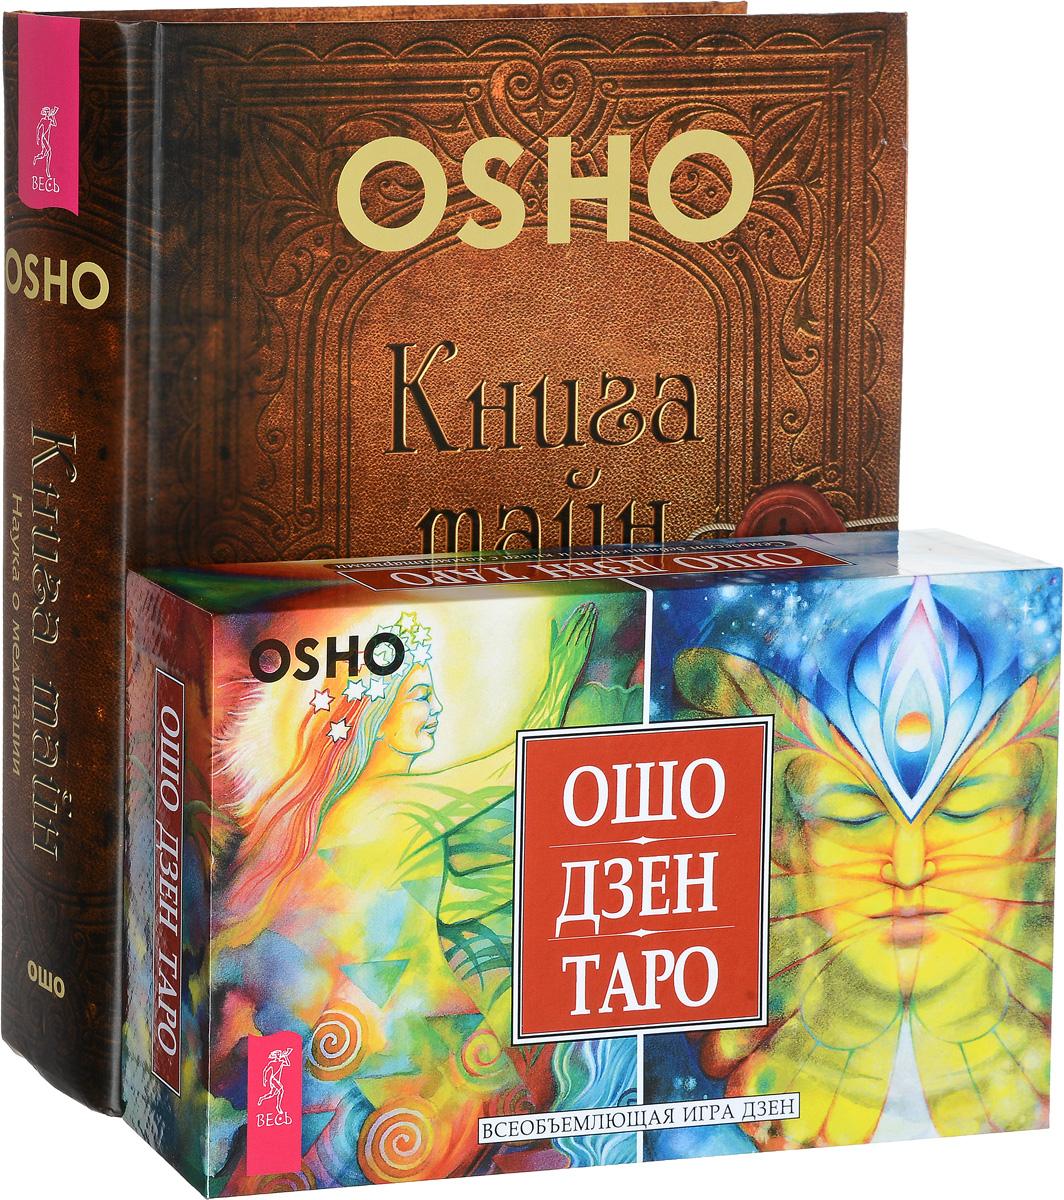 Ошо Ошо Дзен Таро. Книга тайн (комплект из 2 книг + 79 карт) книга тайн